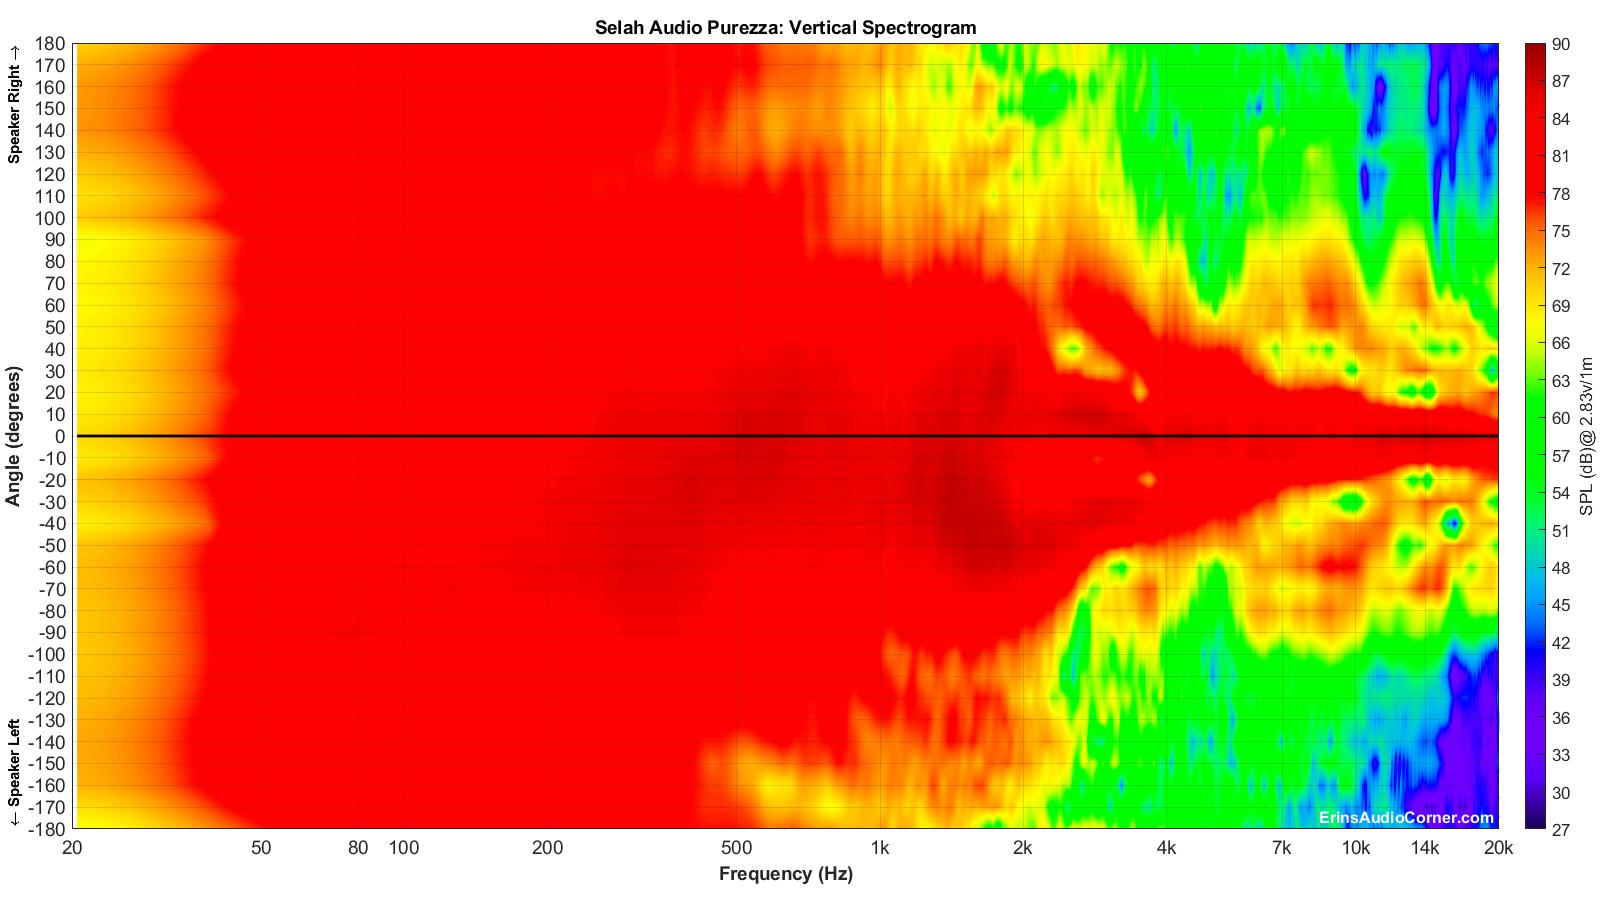 Selah%20Audio%20Purezza_Vertical_Spectrogram_Full.png